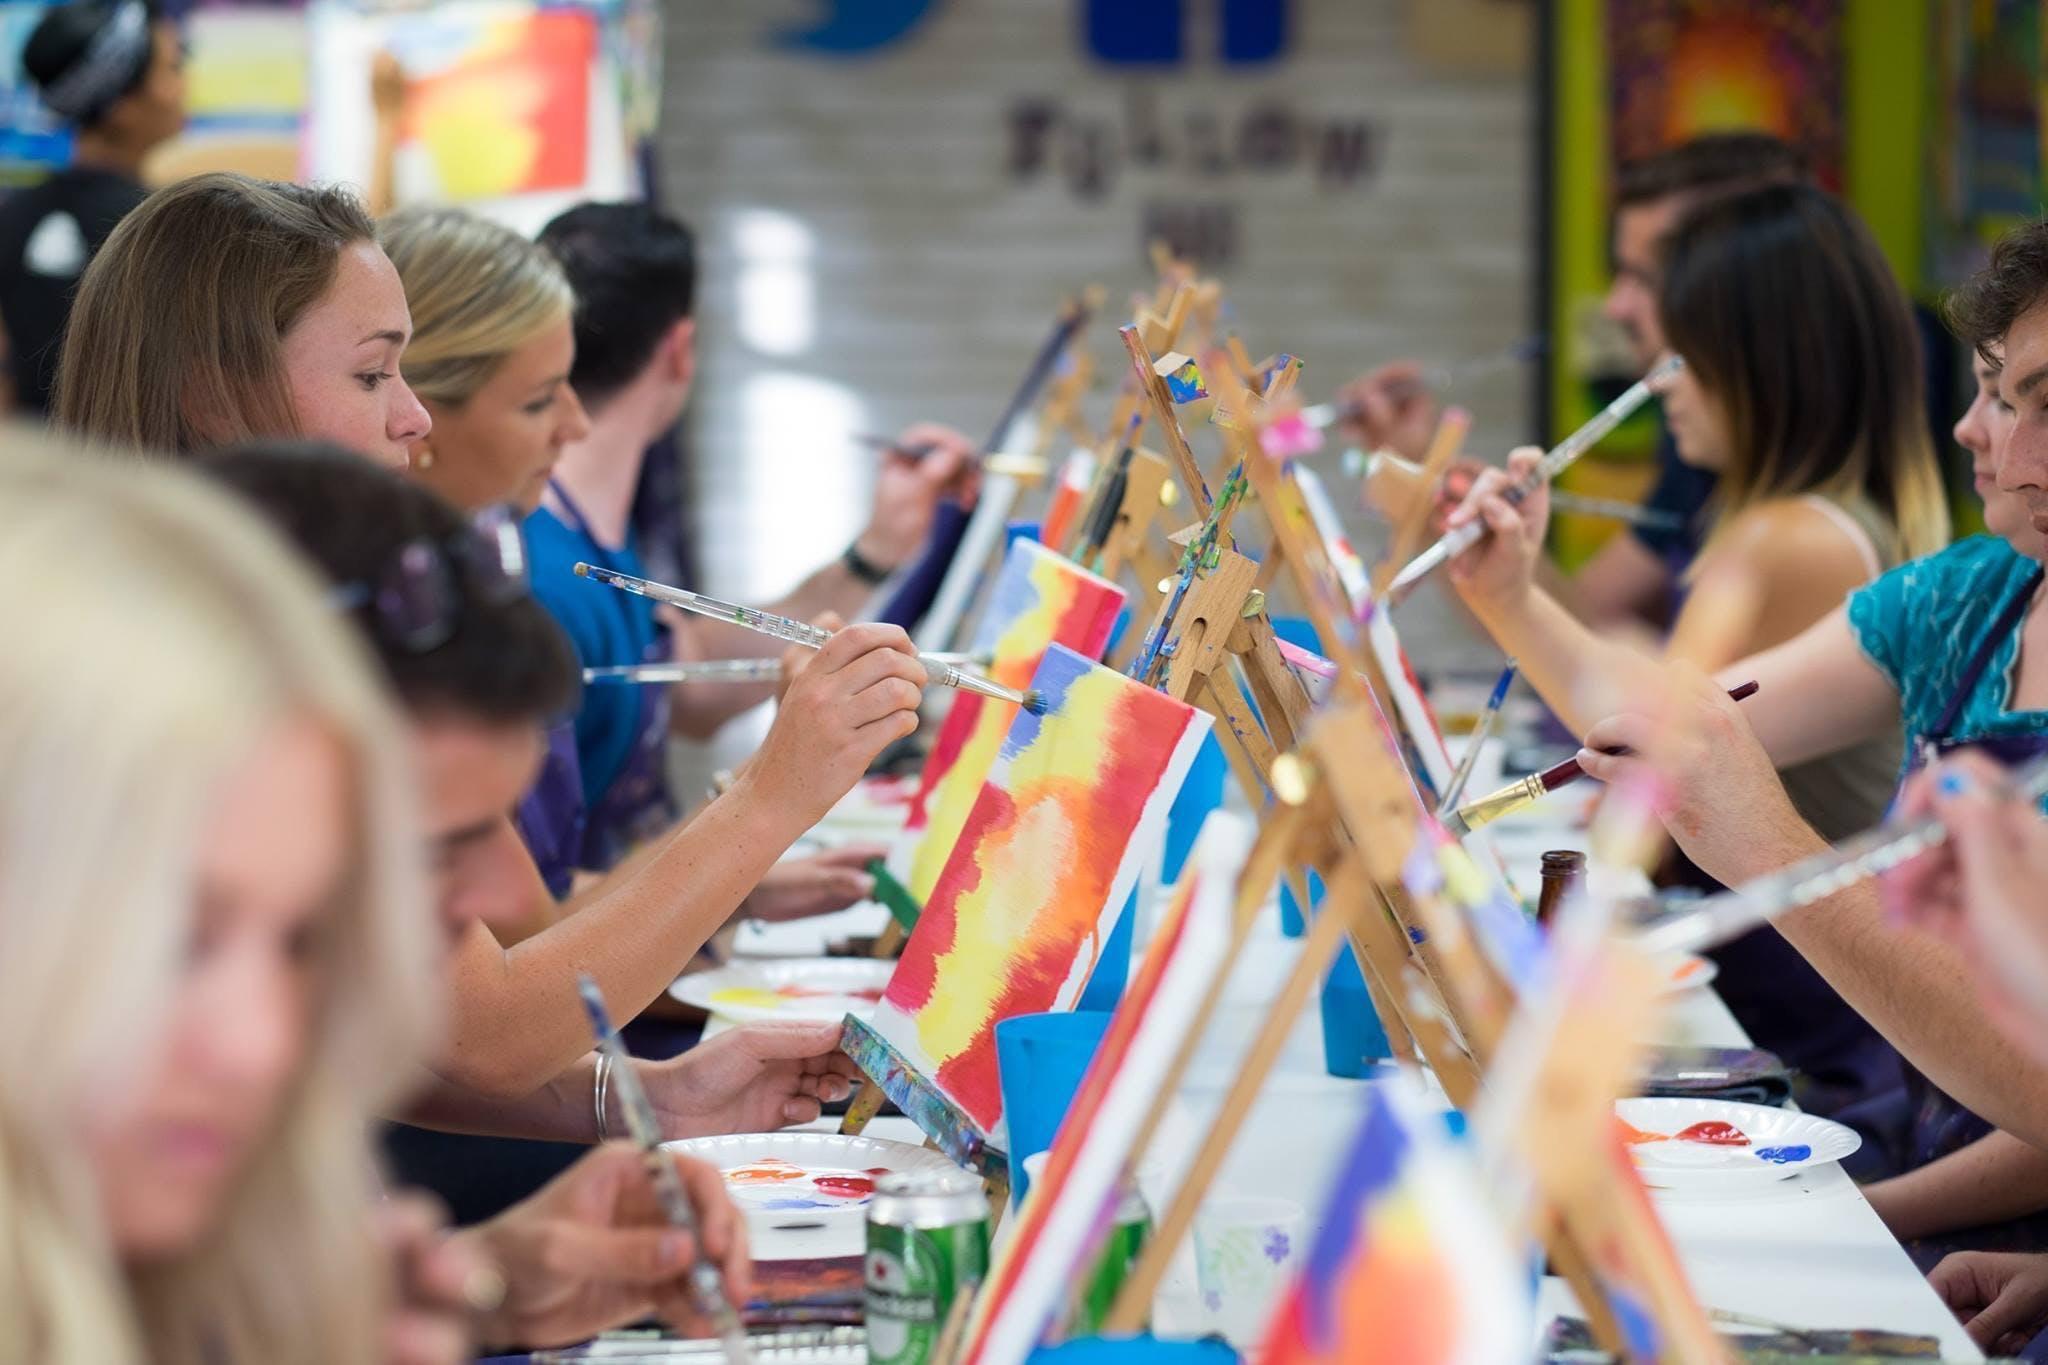 Singles Byob Meet Greet At A Painting Fiesta Pompano Beach